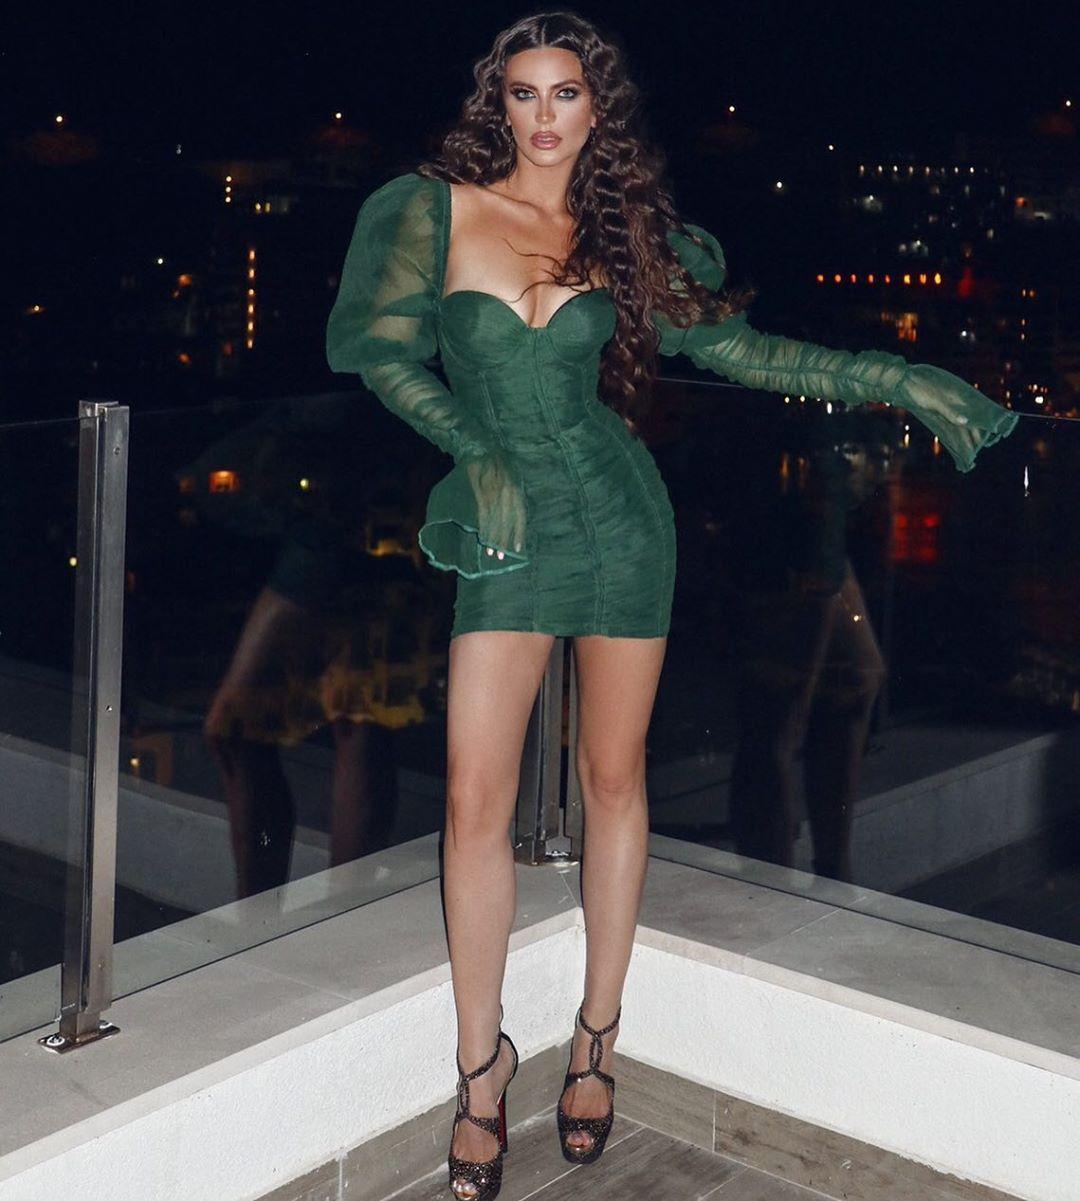 "Fashion Designer on Instagram: ""SO HOT @senoritamilica wearing #IVANJAKIC dark green dress"